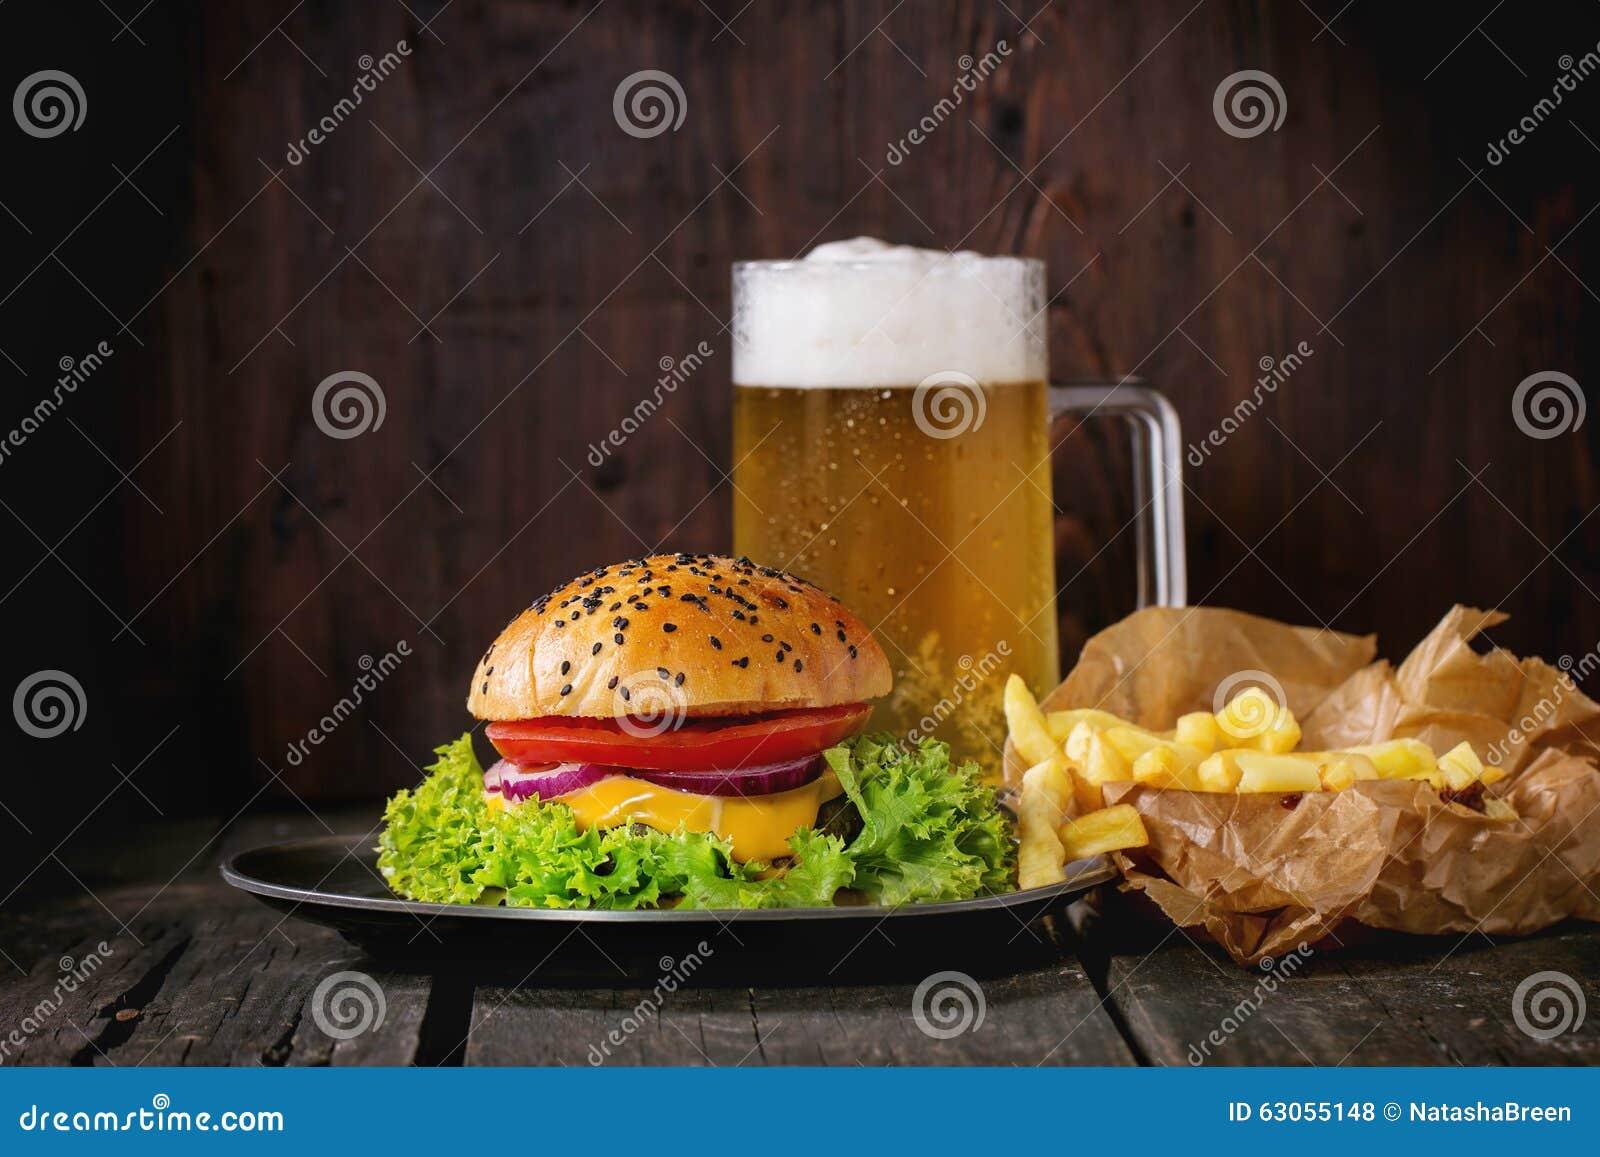 Domowej roboty hamburger z piwem i grulami